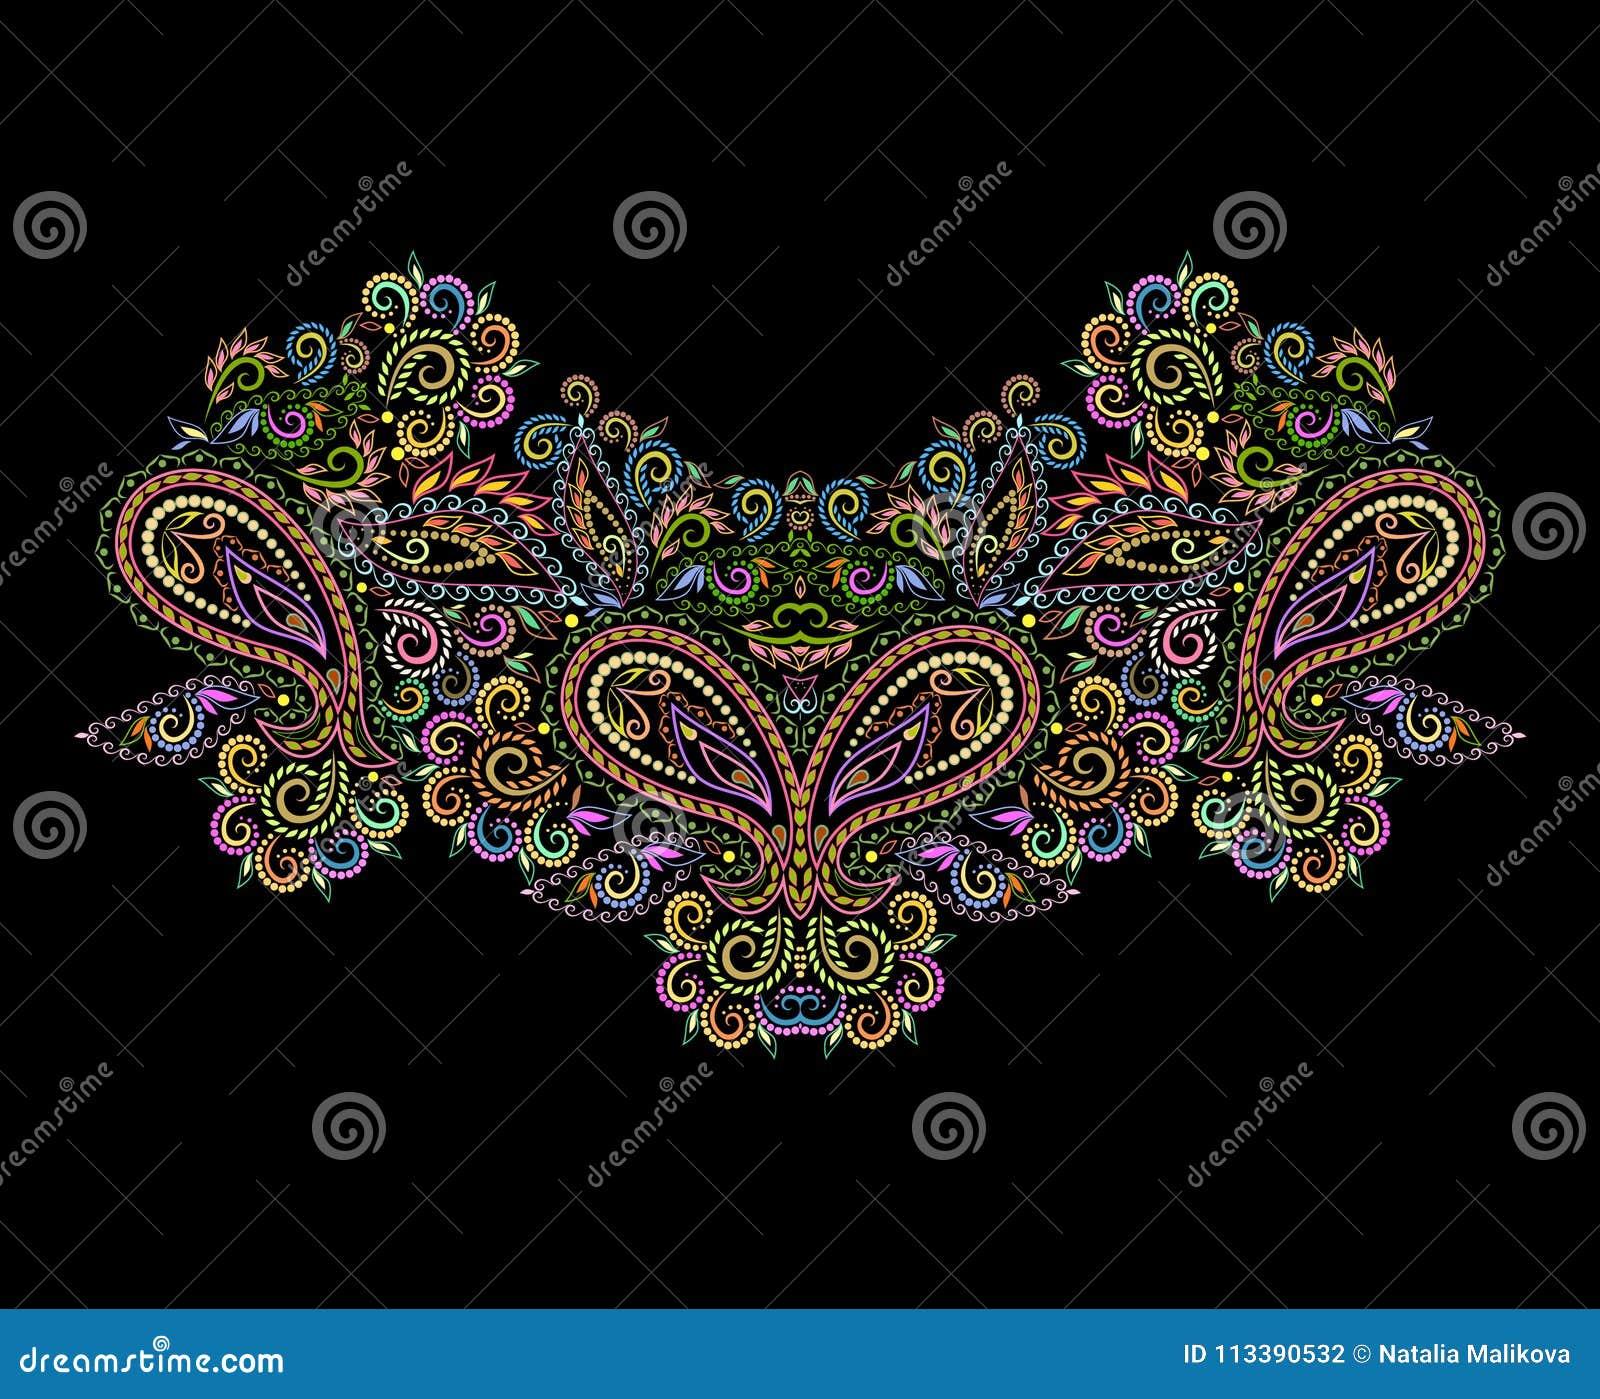 Neckline Ethnic Design Floral Bohemian Pattern Stock Vector